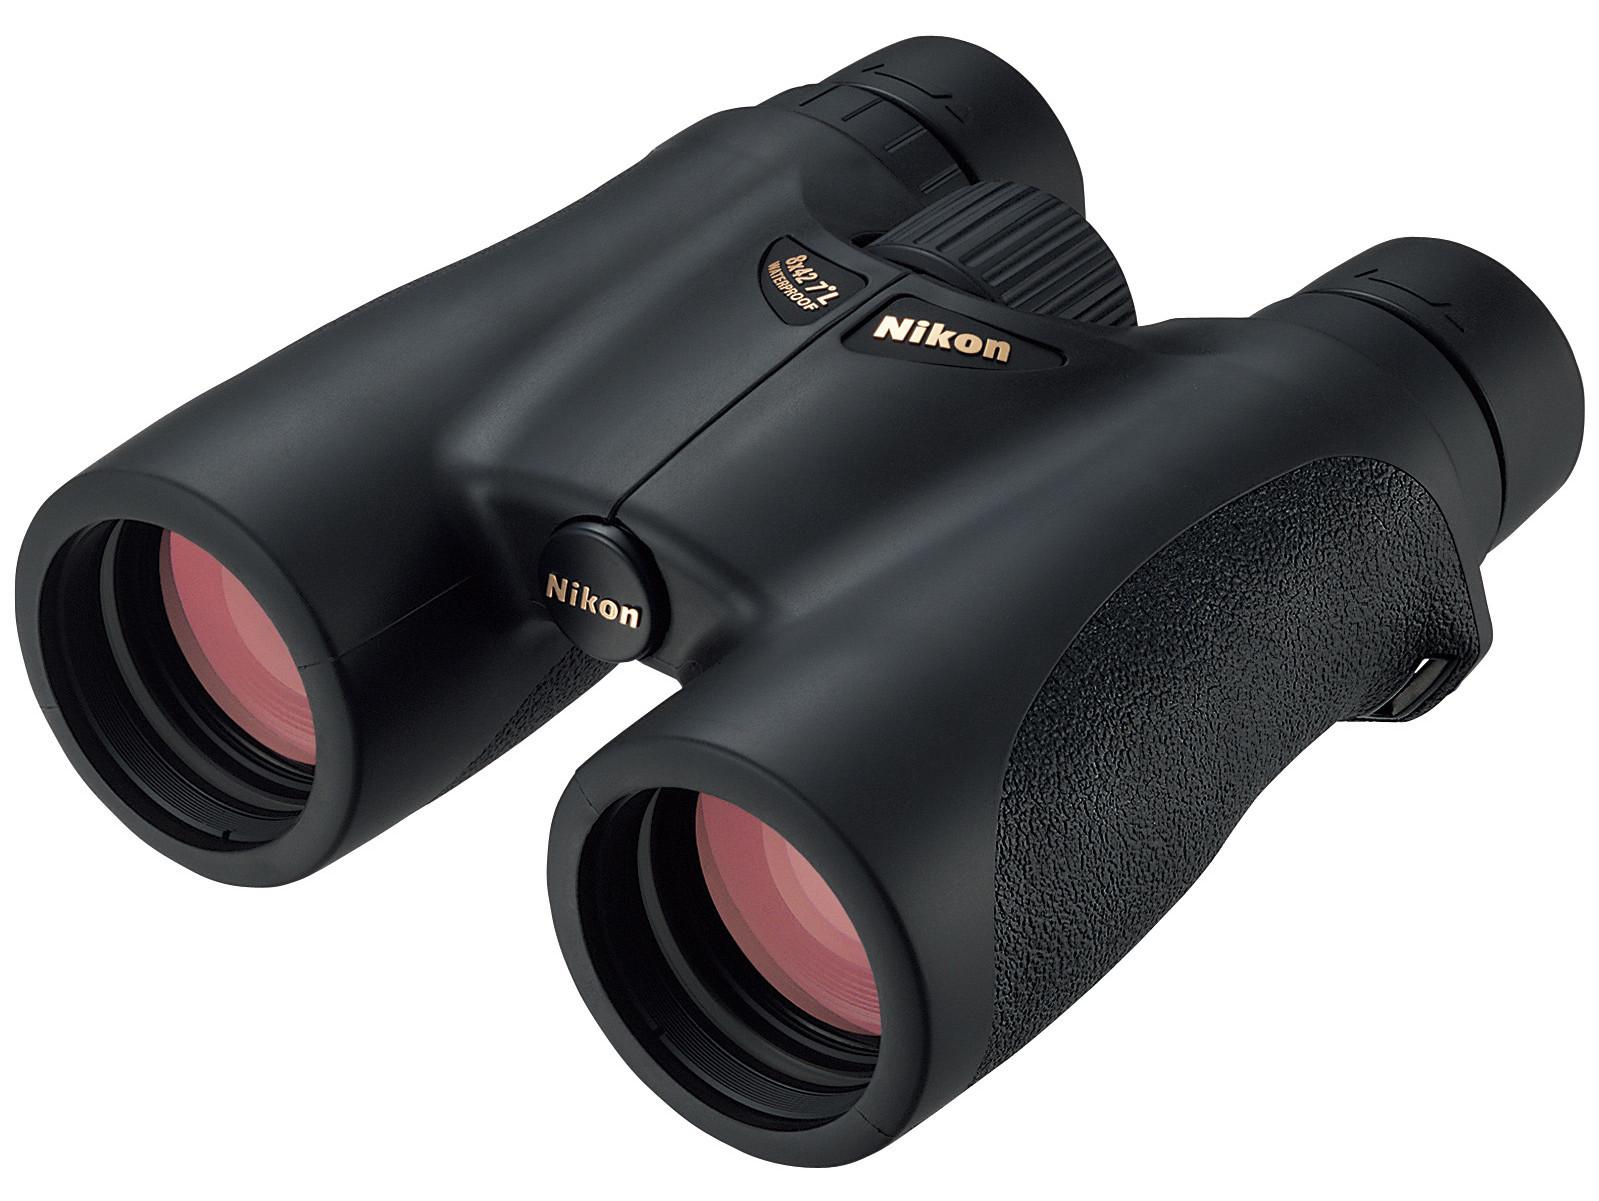 HG L DCF WP 8X42 雙筒望遠鏡 雙筒望遠鏡/單眼鏡-高眼點設計